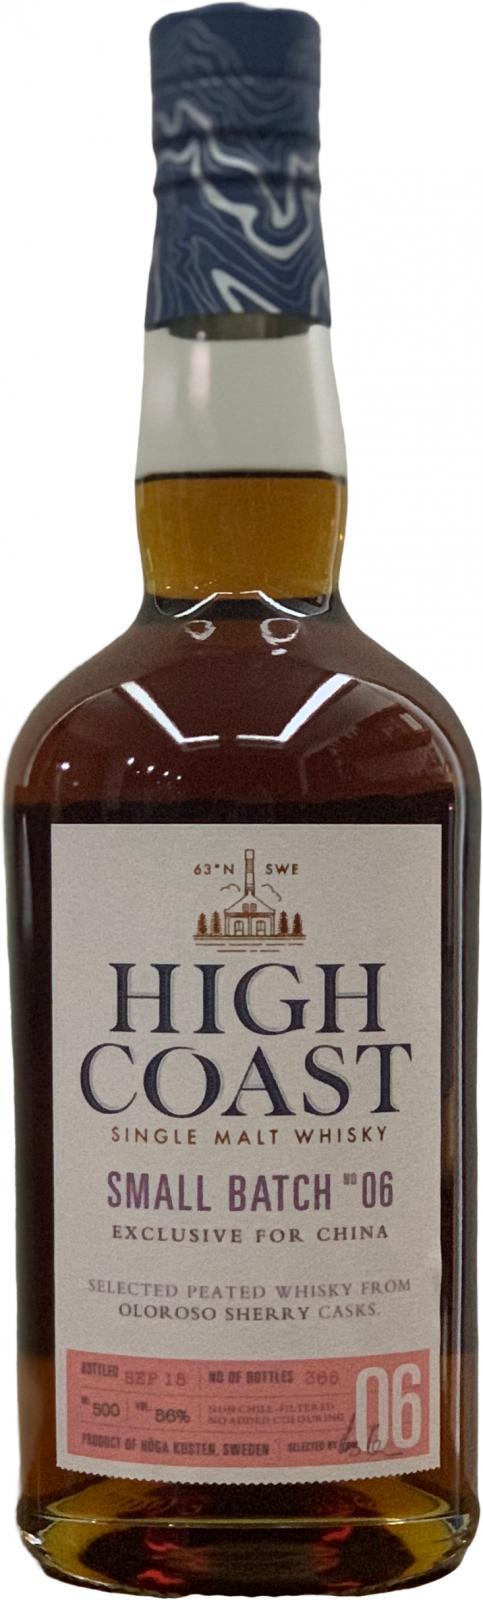 High Coast Small Batch No 6